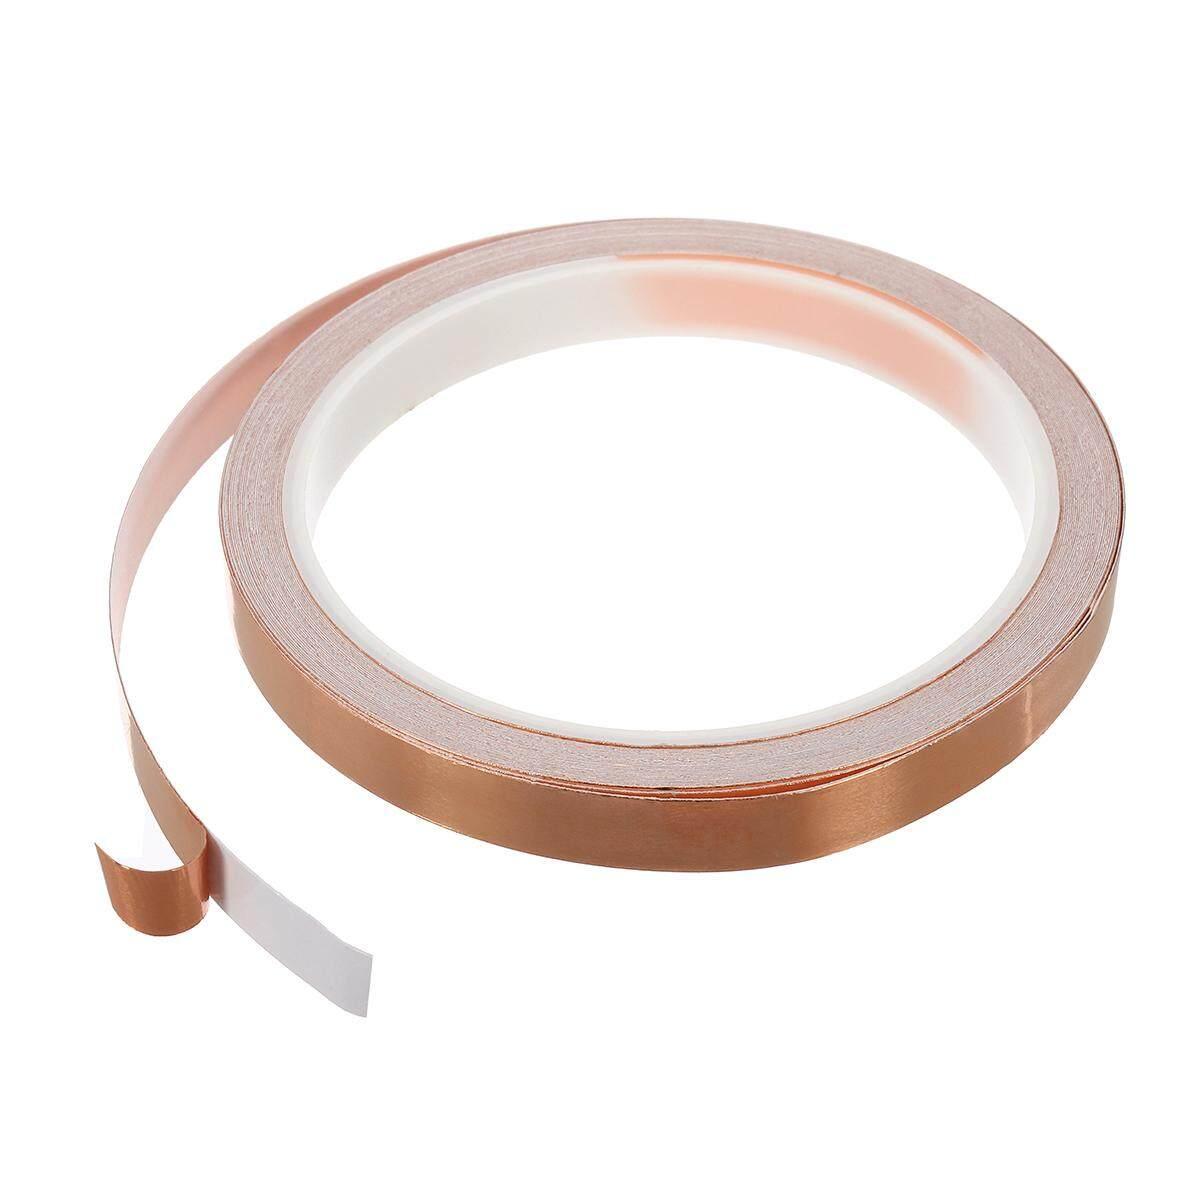 10m 10mm Single-sided Adhesive Conductive Copper Foil Tape Guitar Pickup EMI Shield